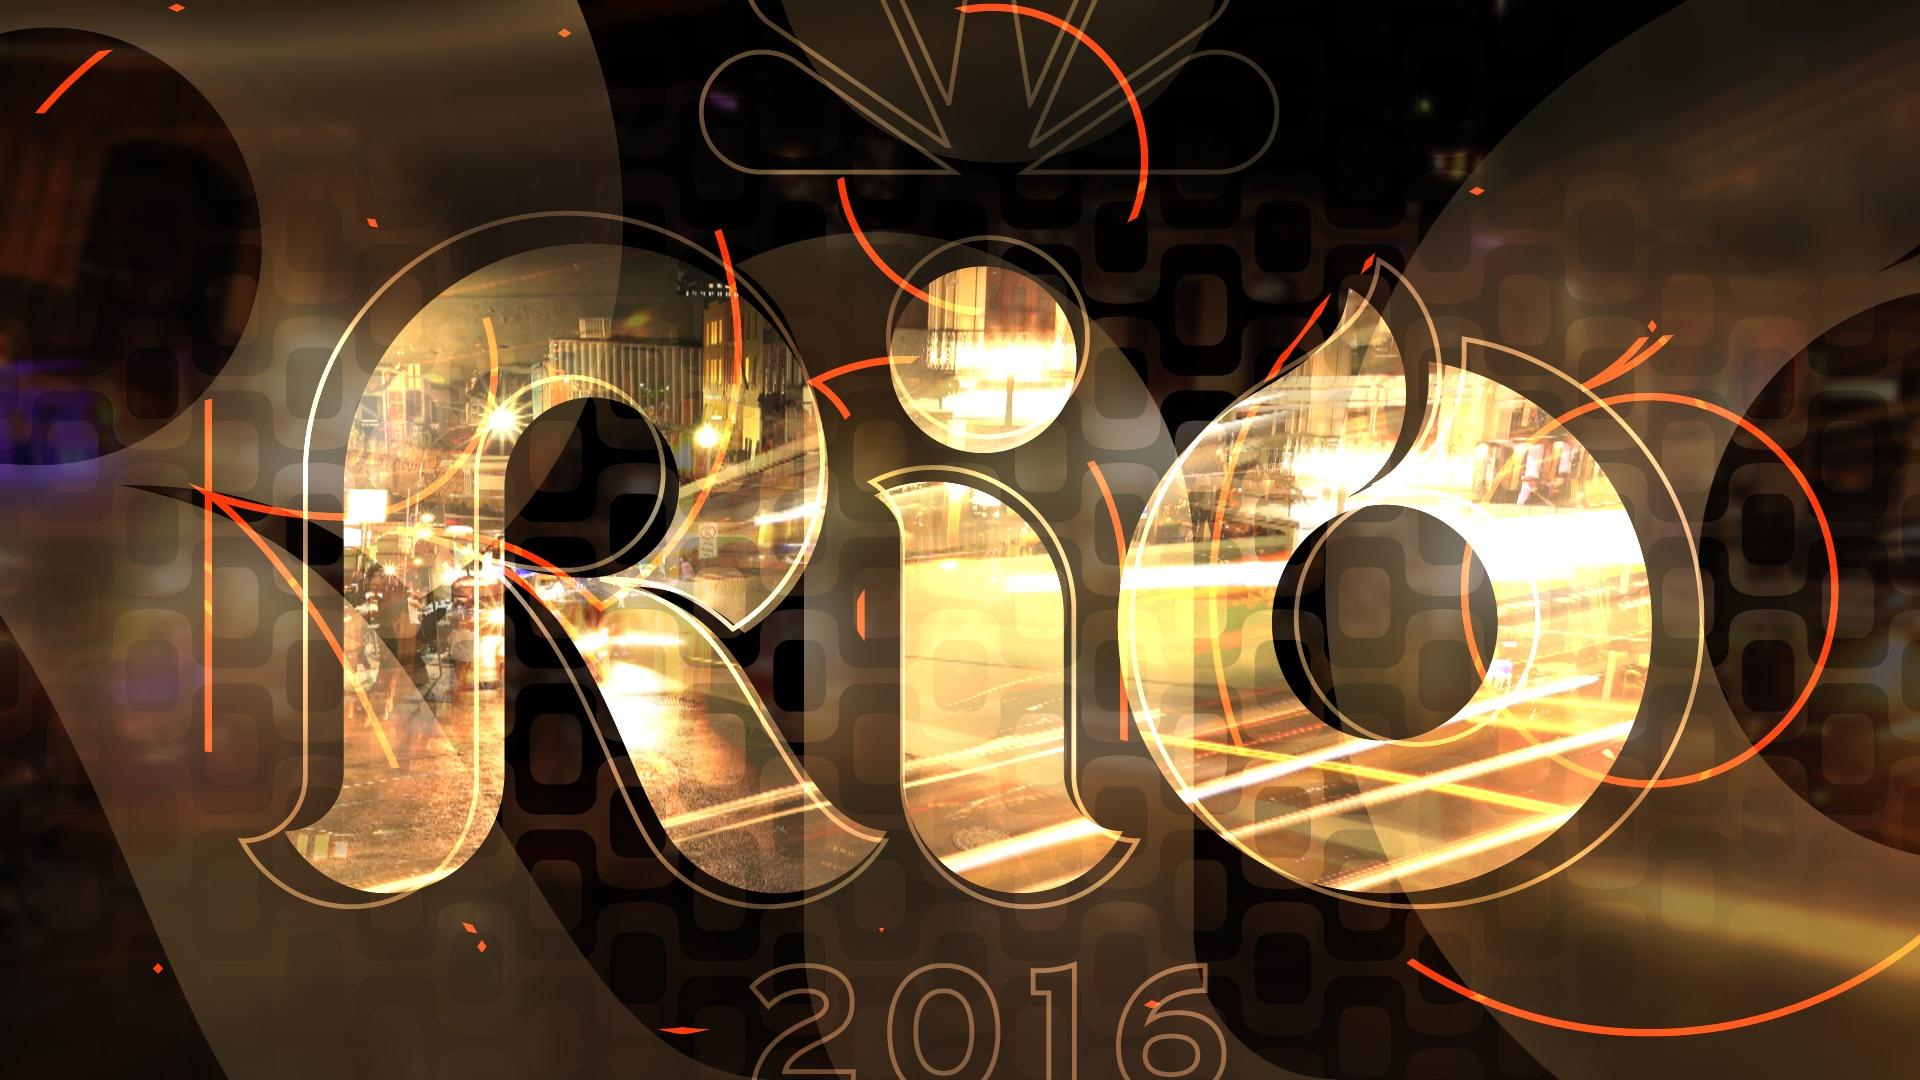 OLYMPIC LATE NIGHT - NBC OLYMPICS